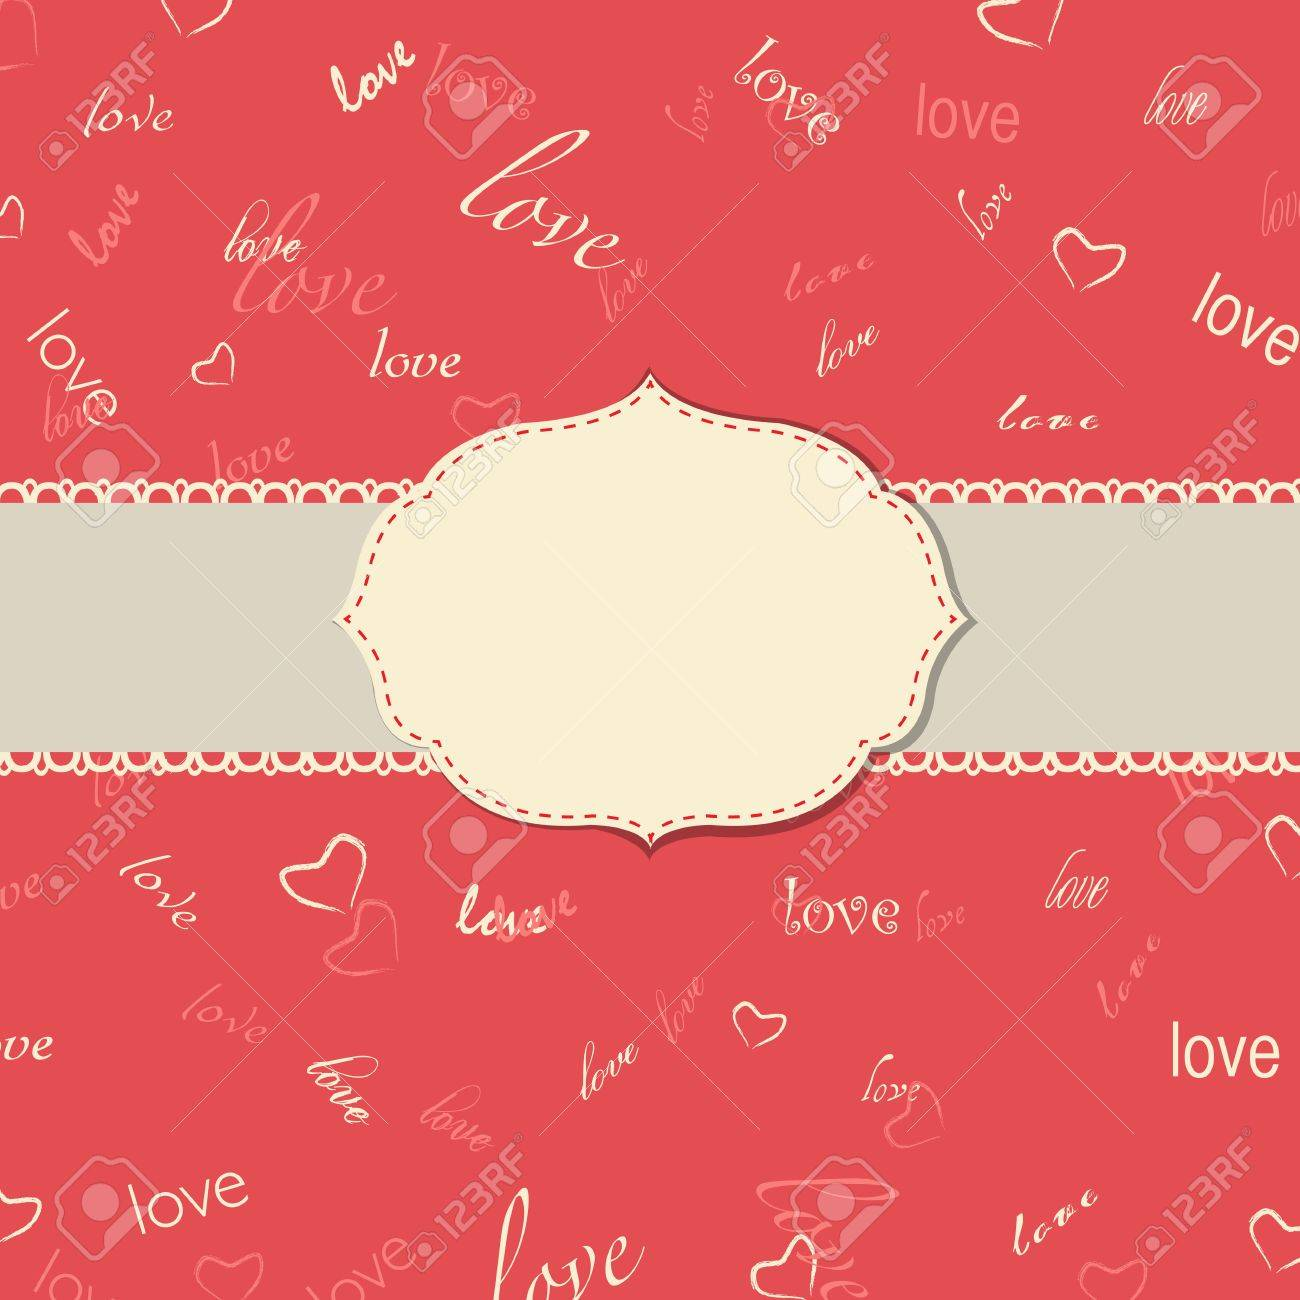 Vintage Love Greeting Card, Vector Illustration Stock Vector - 12076349